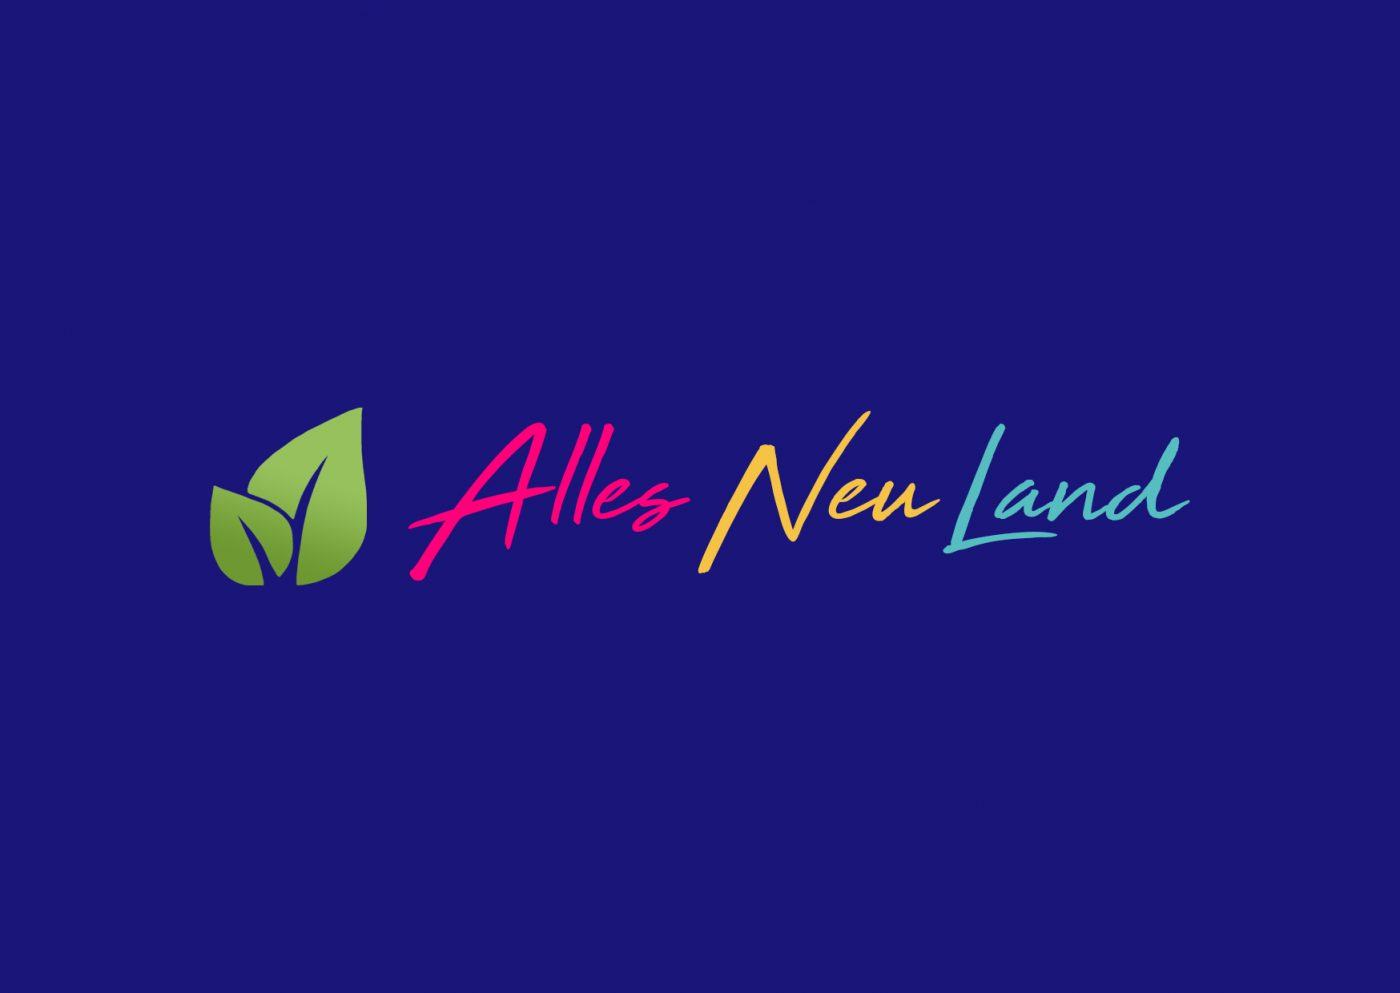 Alles Neu Land